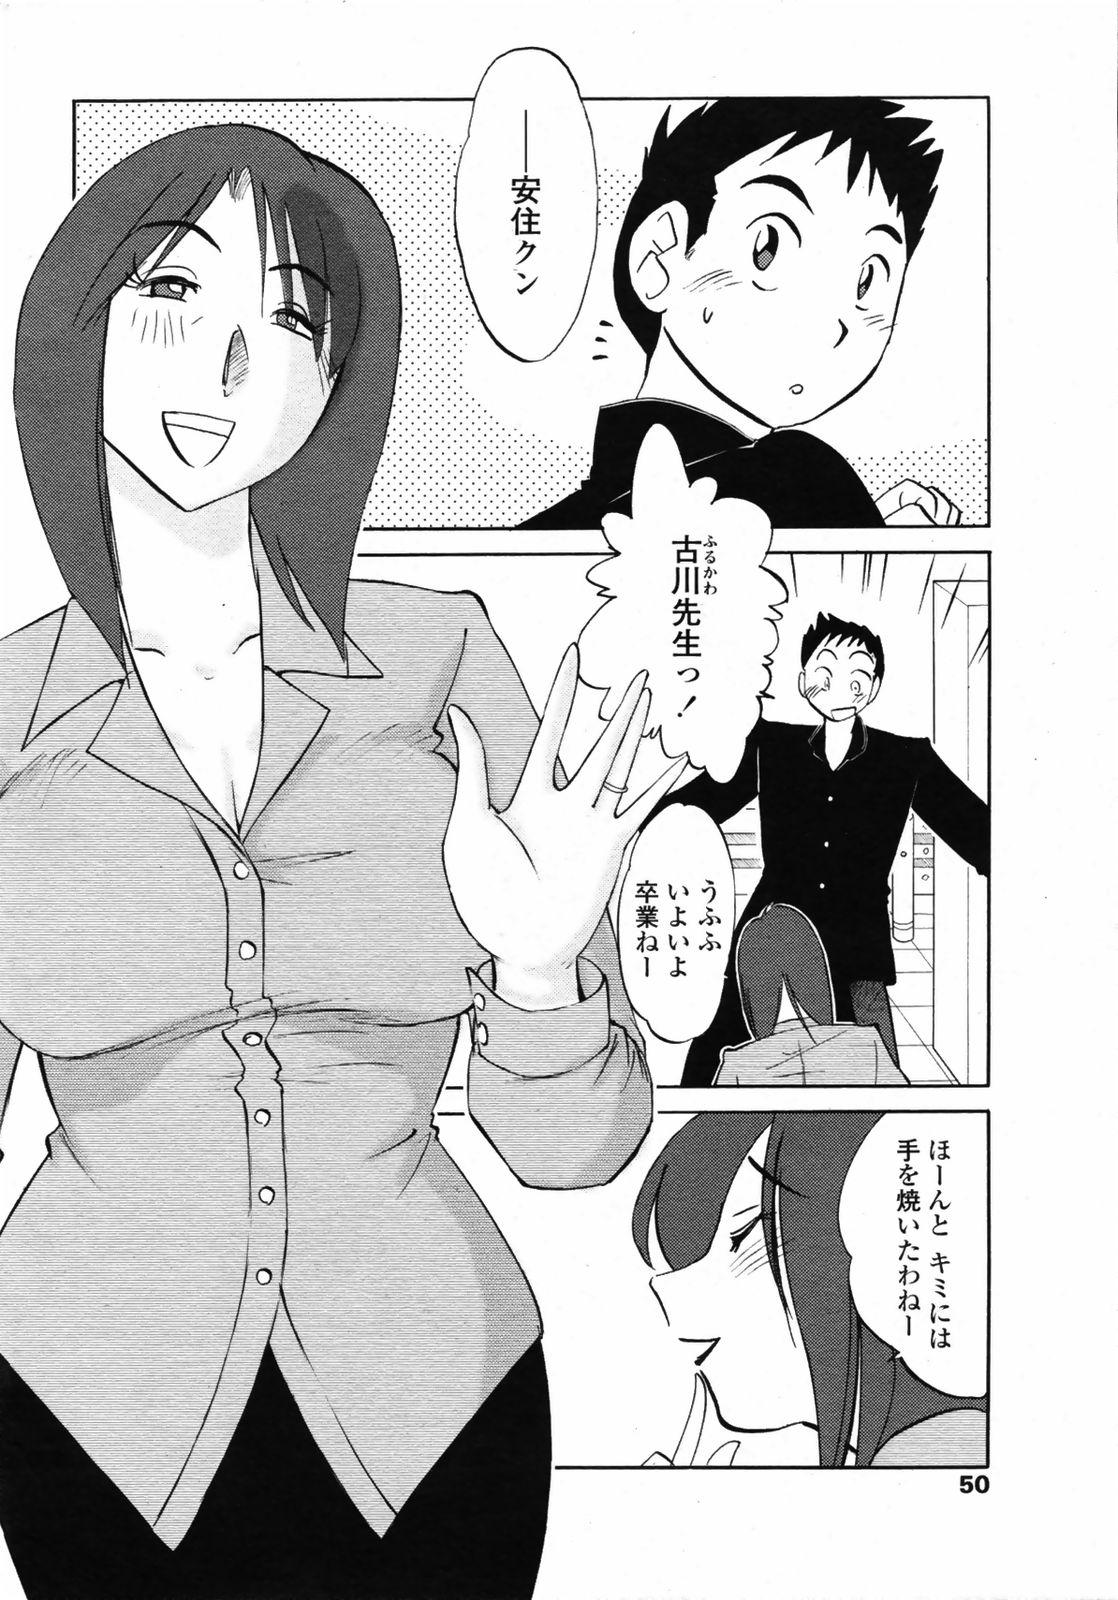 [Tsuyatsuya] Azumi-kun to Issho chapt.1-5 (Comic Penguin Club) 1